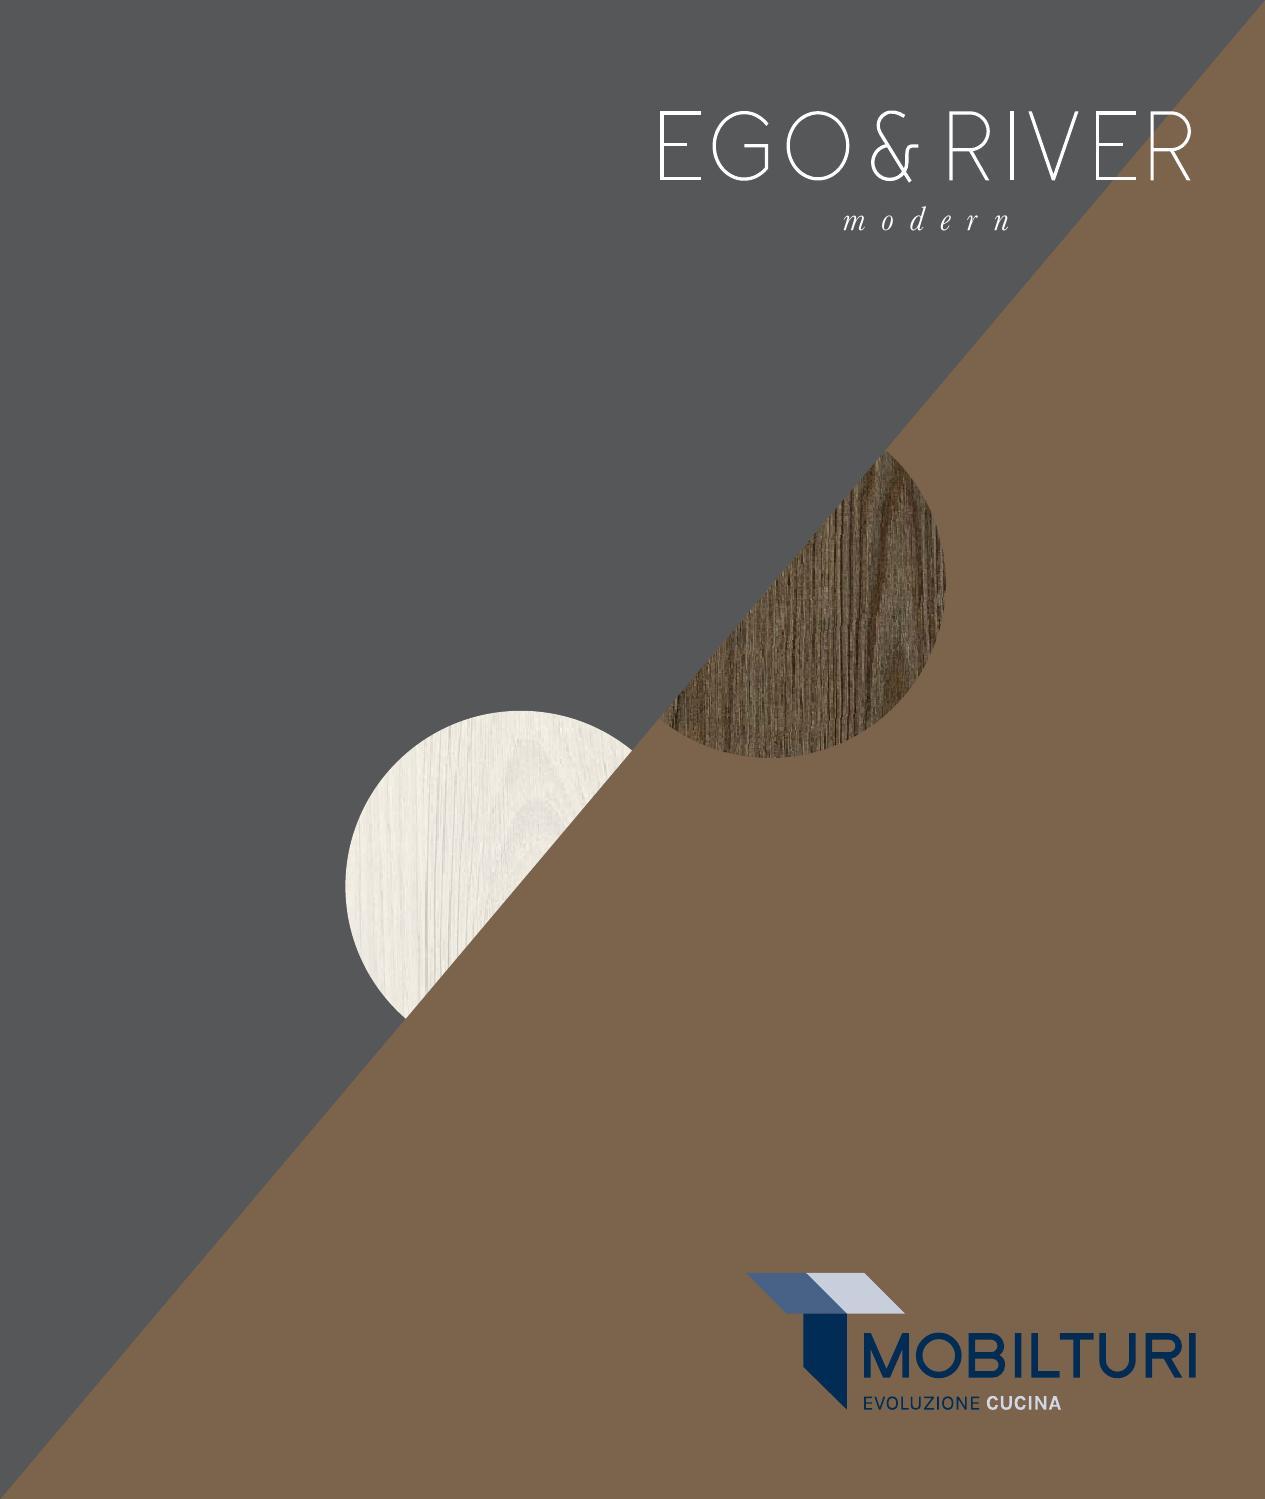 EGO & RIVER cucine moderne / modern kitchens MOBILTURI by Ingenia ...